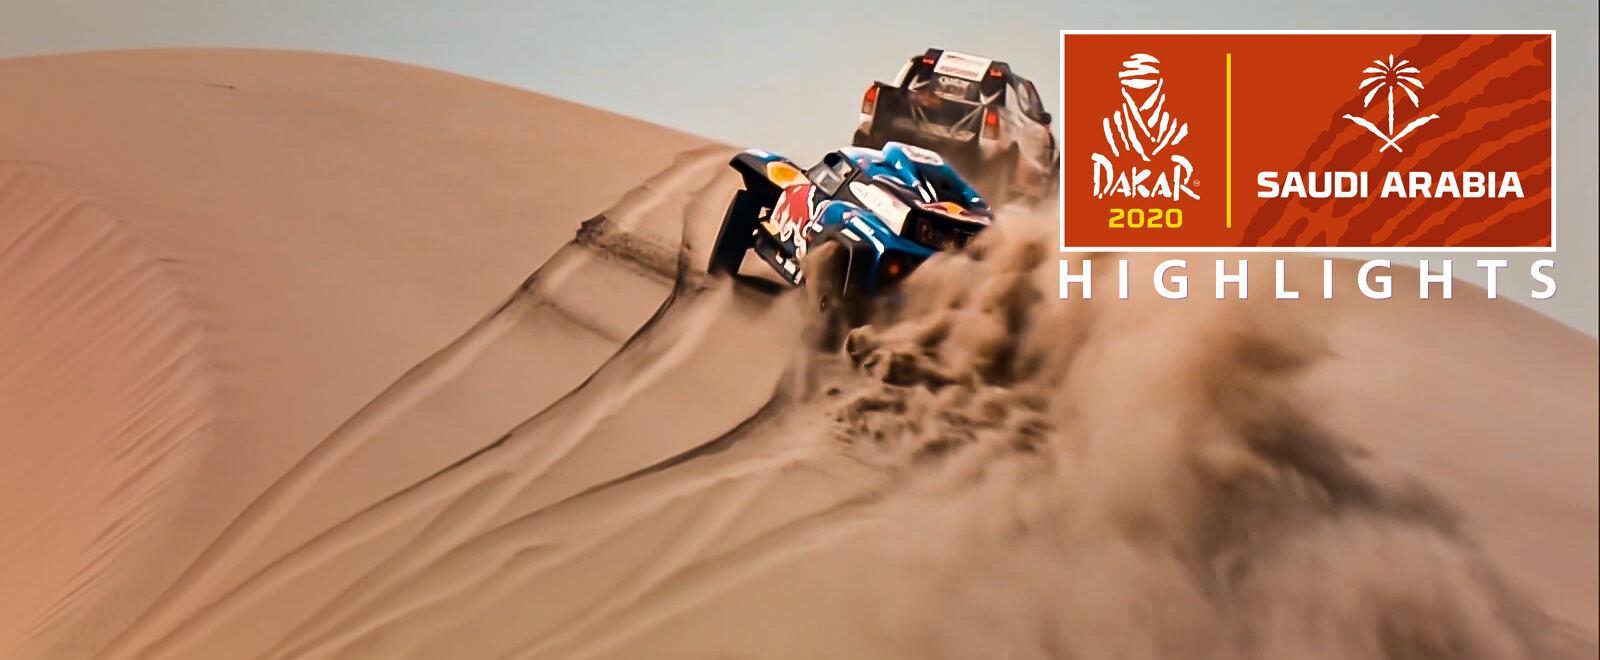 Highlights Dakar 2020